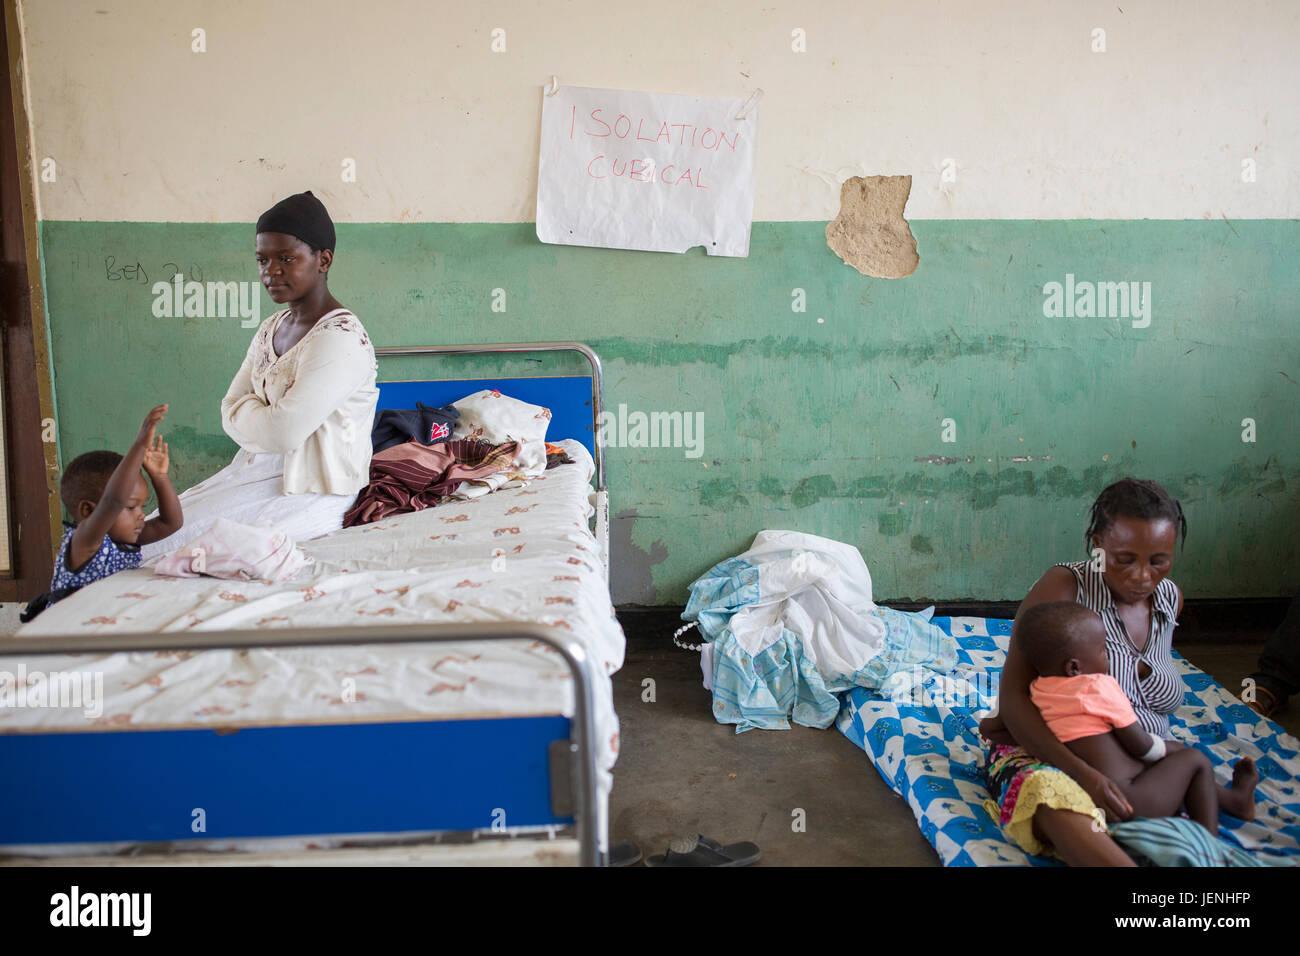 Mothers and children sit in the isolation ward in Bundibugyo Hospital, Uganda. - Stock Image